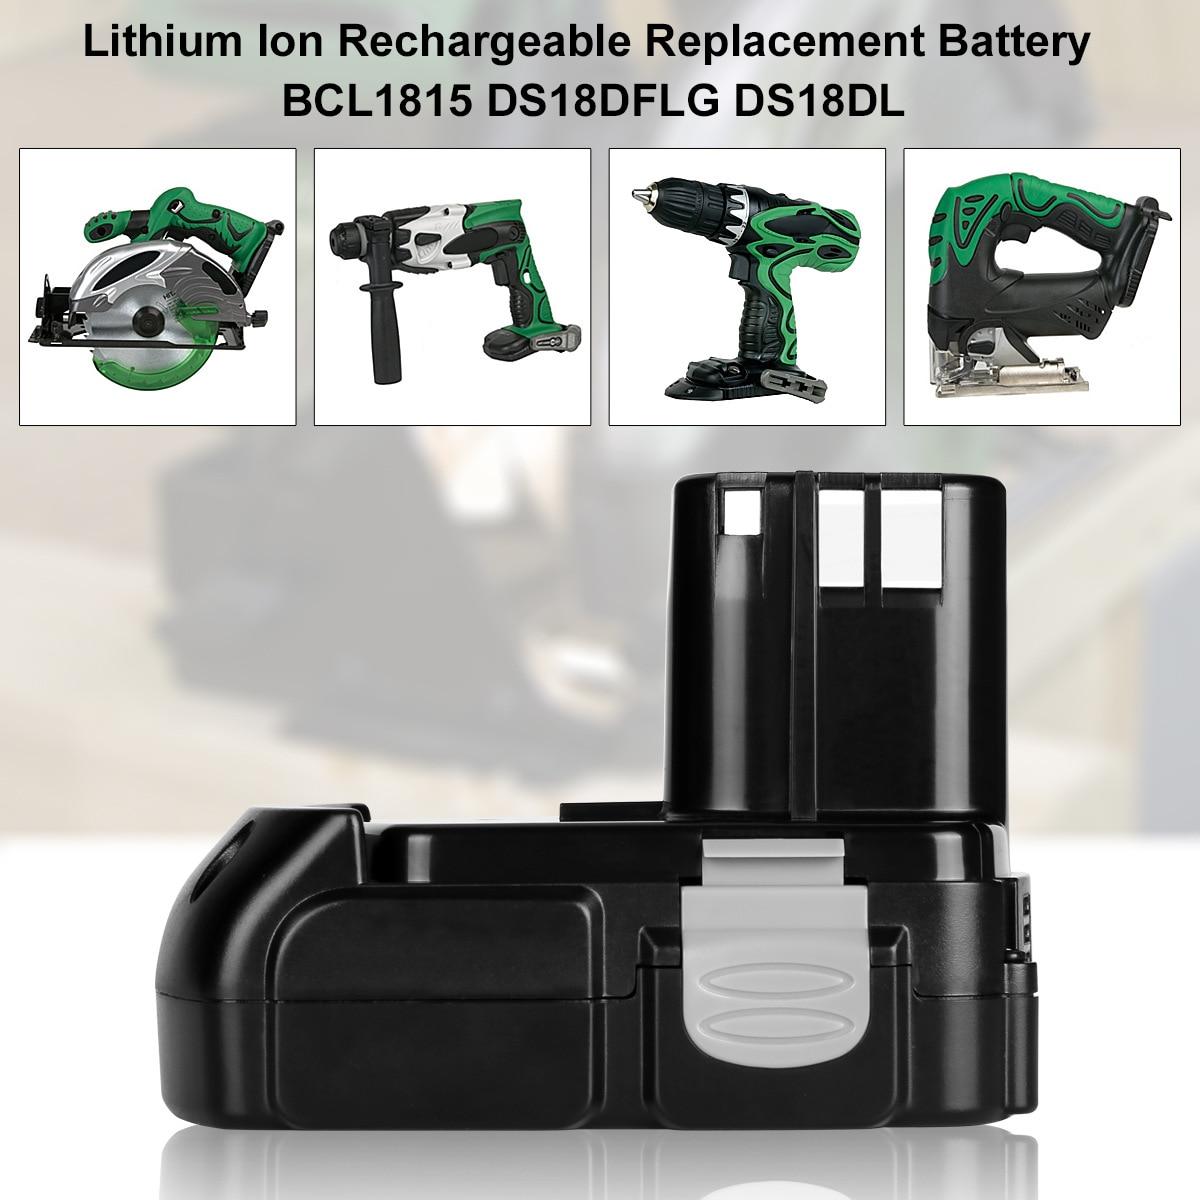 18В 2.0Ah литиевая аккумуляторная батарея для Hitachi BCL1815 BCL1830 EBM1830 DS18DFL CJ18DL DS18DL WR18DMR электроинструменты Batteria